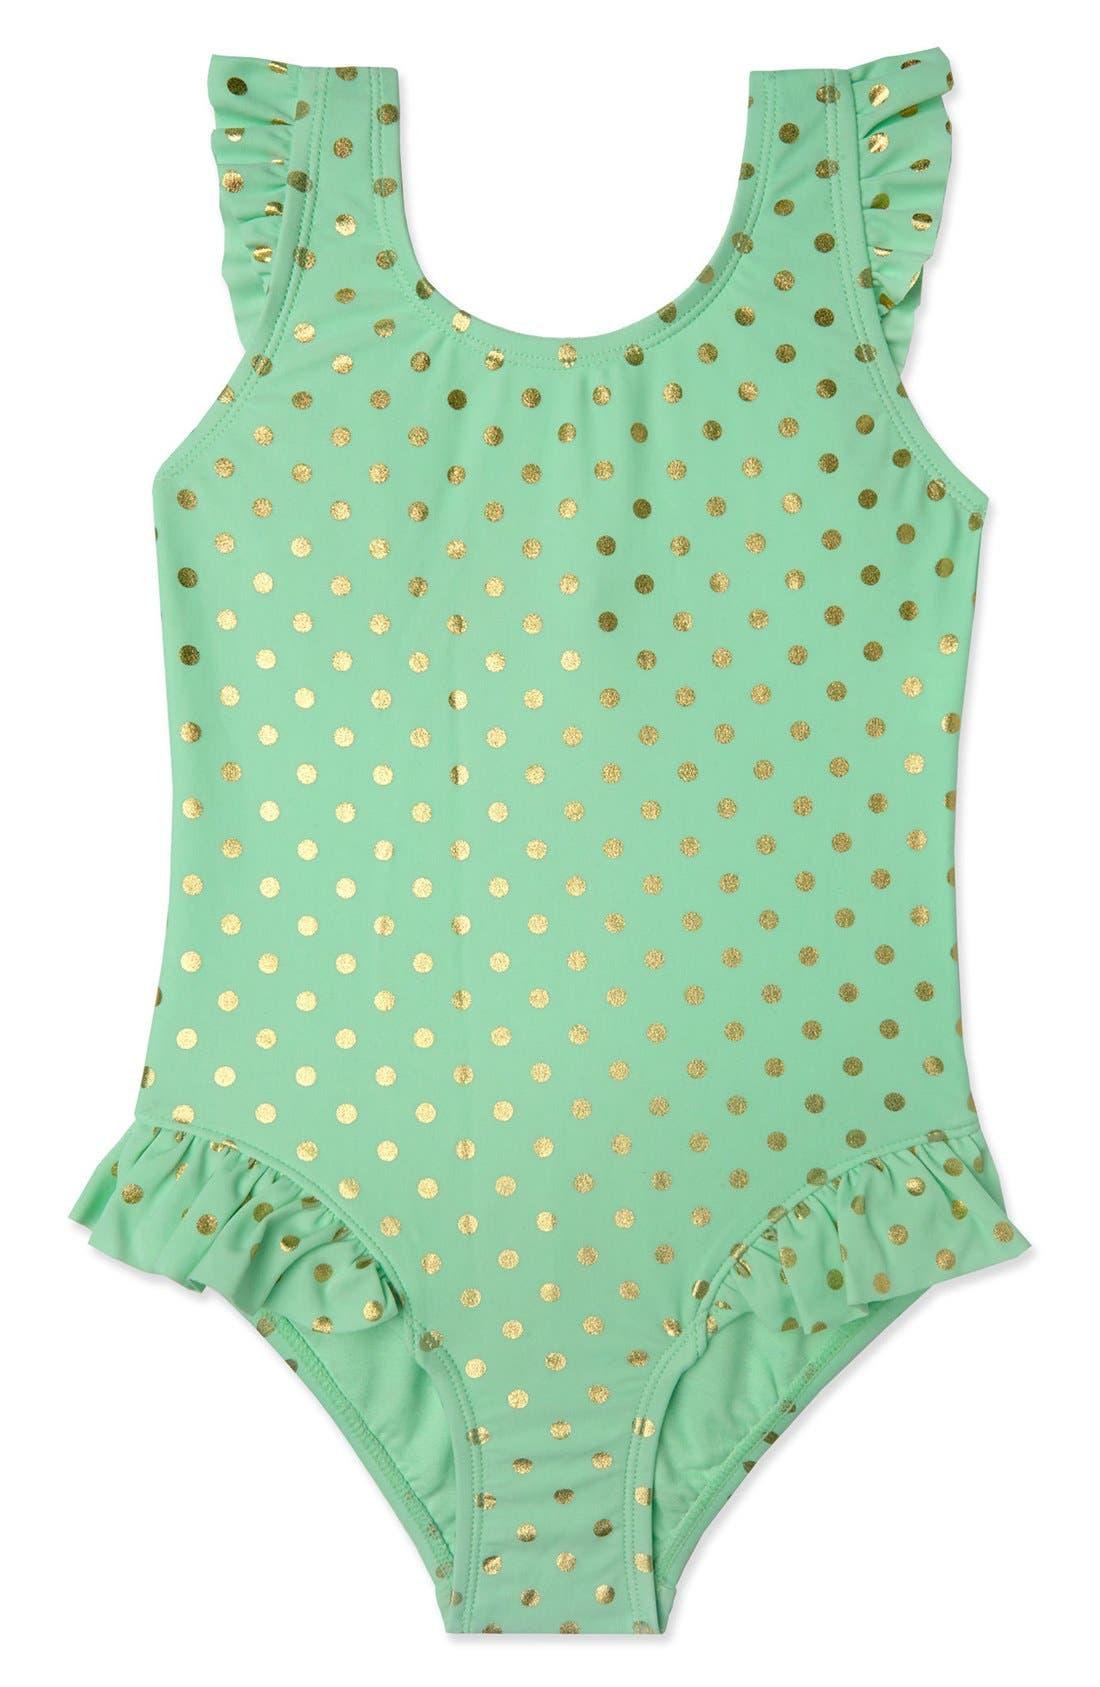 Alternate Image 1 Selected - Hula Star 'Milkshake' One-Piece Swimsuit (Toddler Girls & Little Girls)